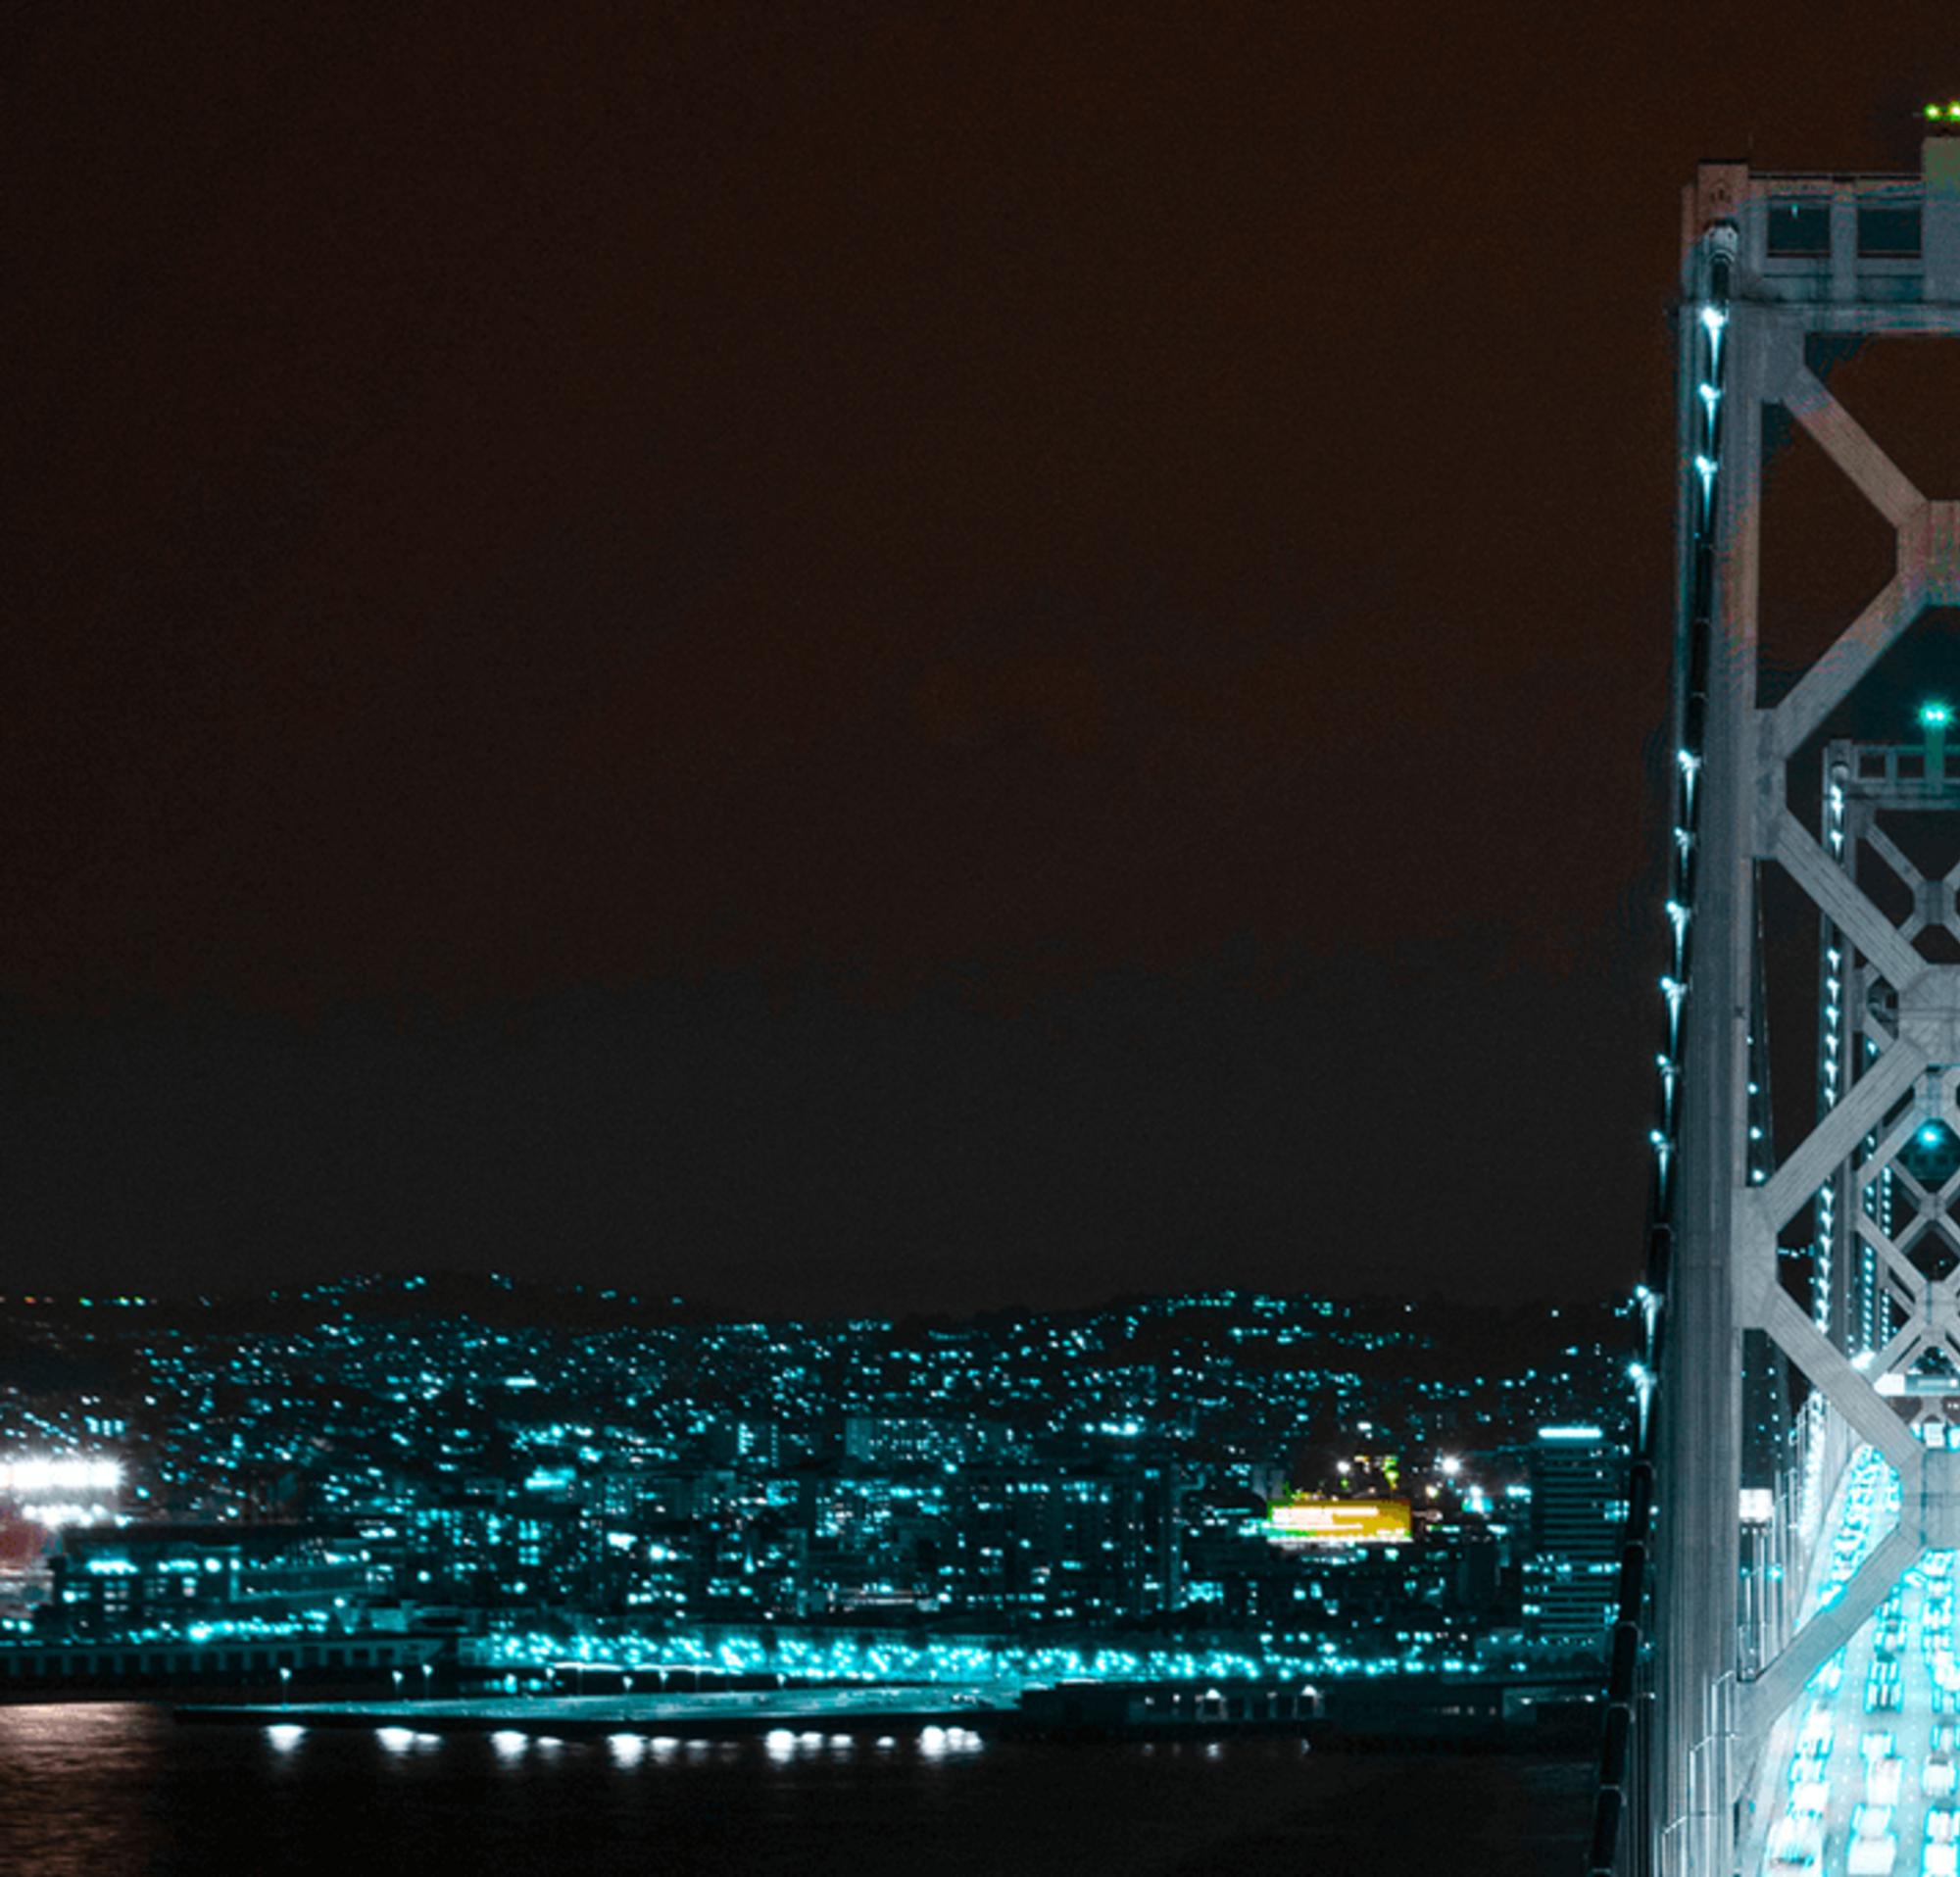 Vista nocturna de San Francisco, donde se observa la Salesforce Tower